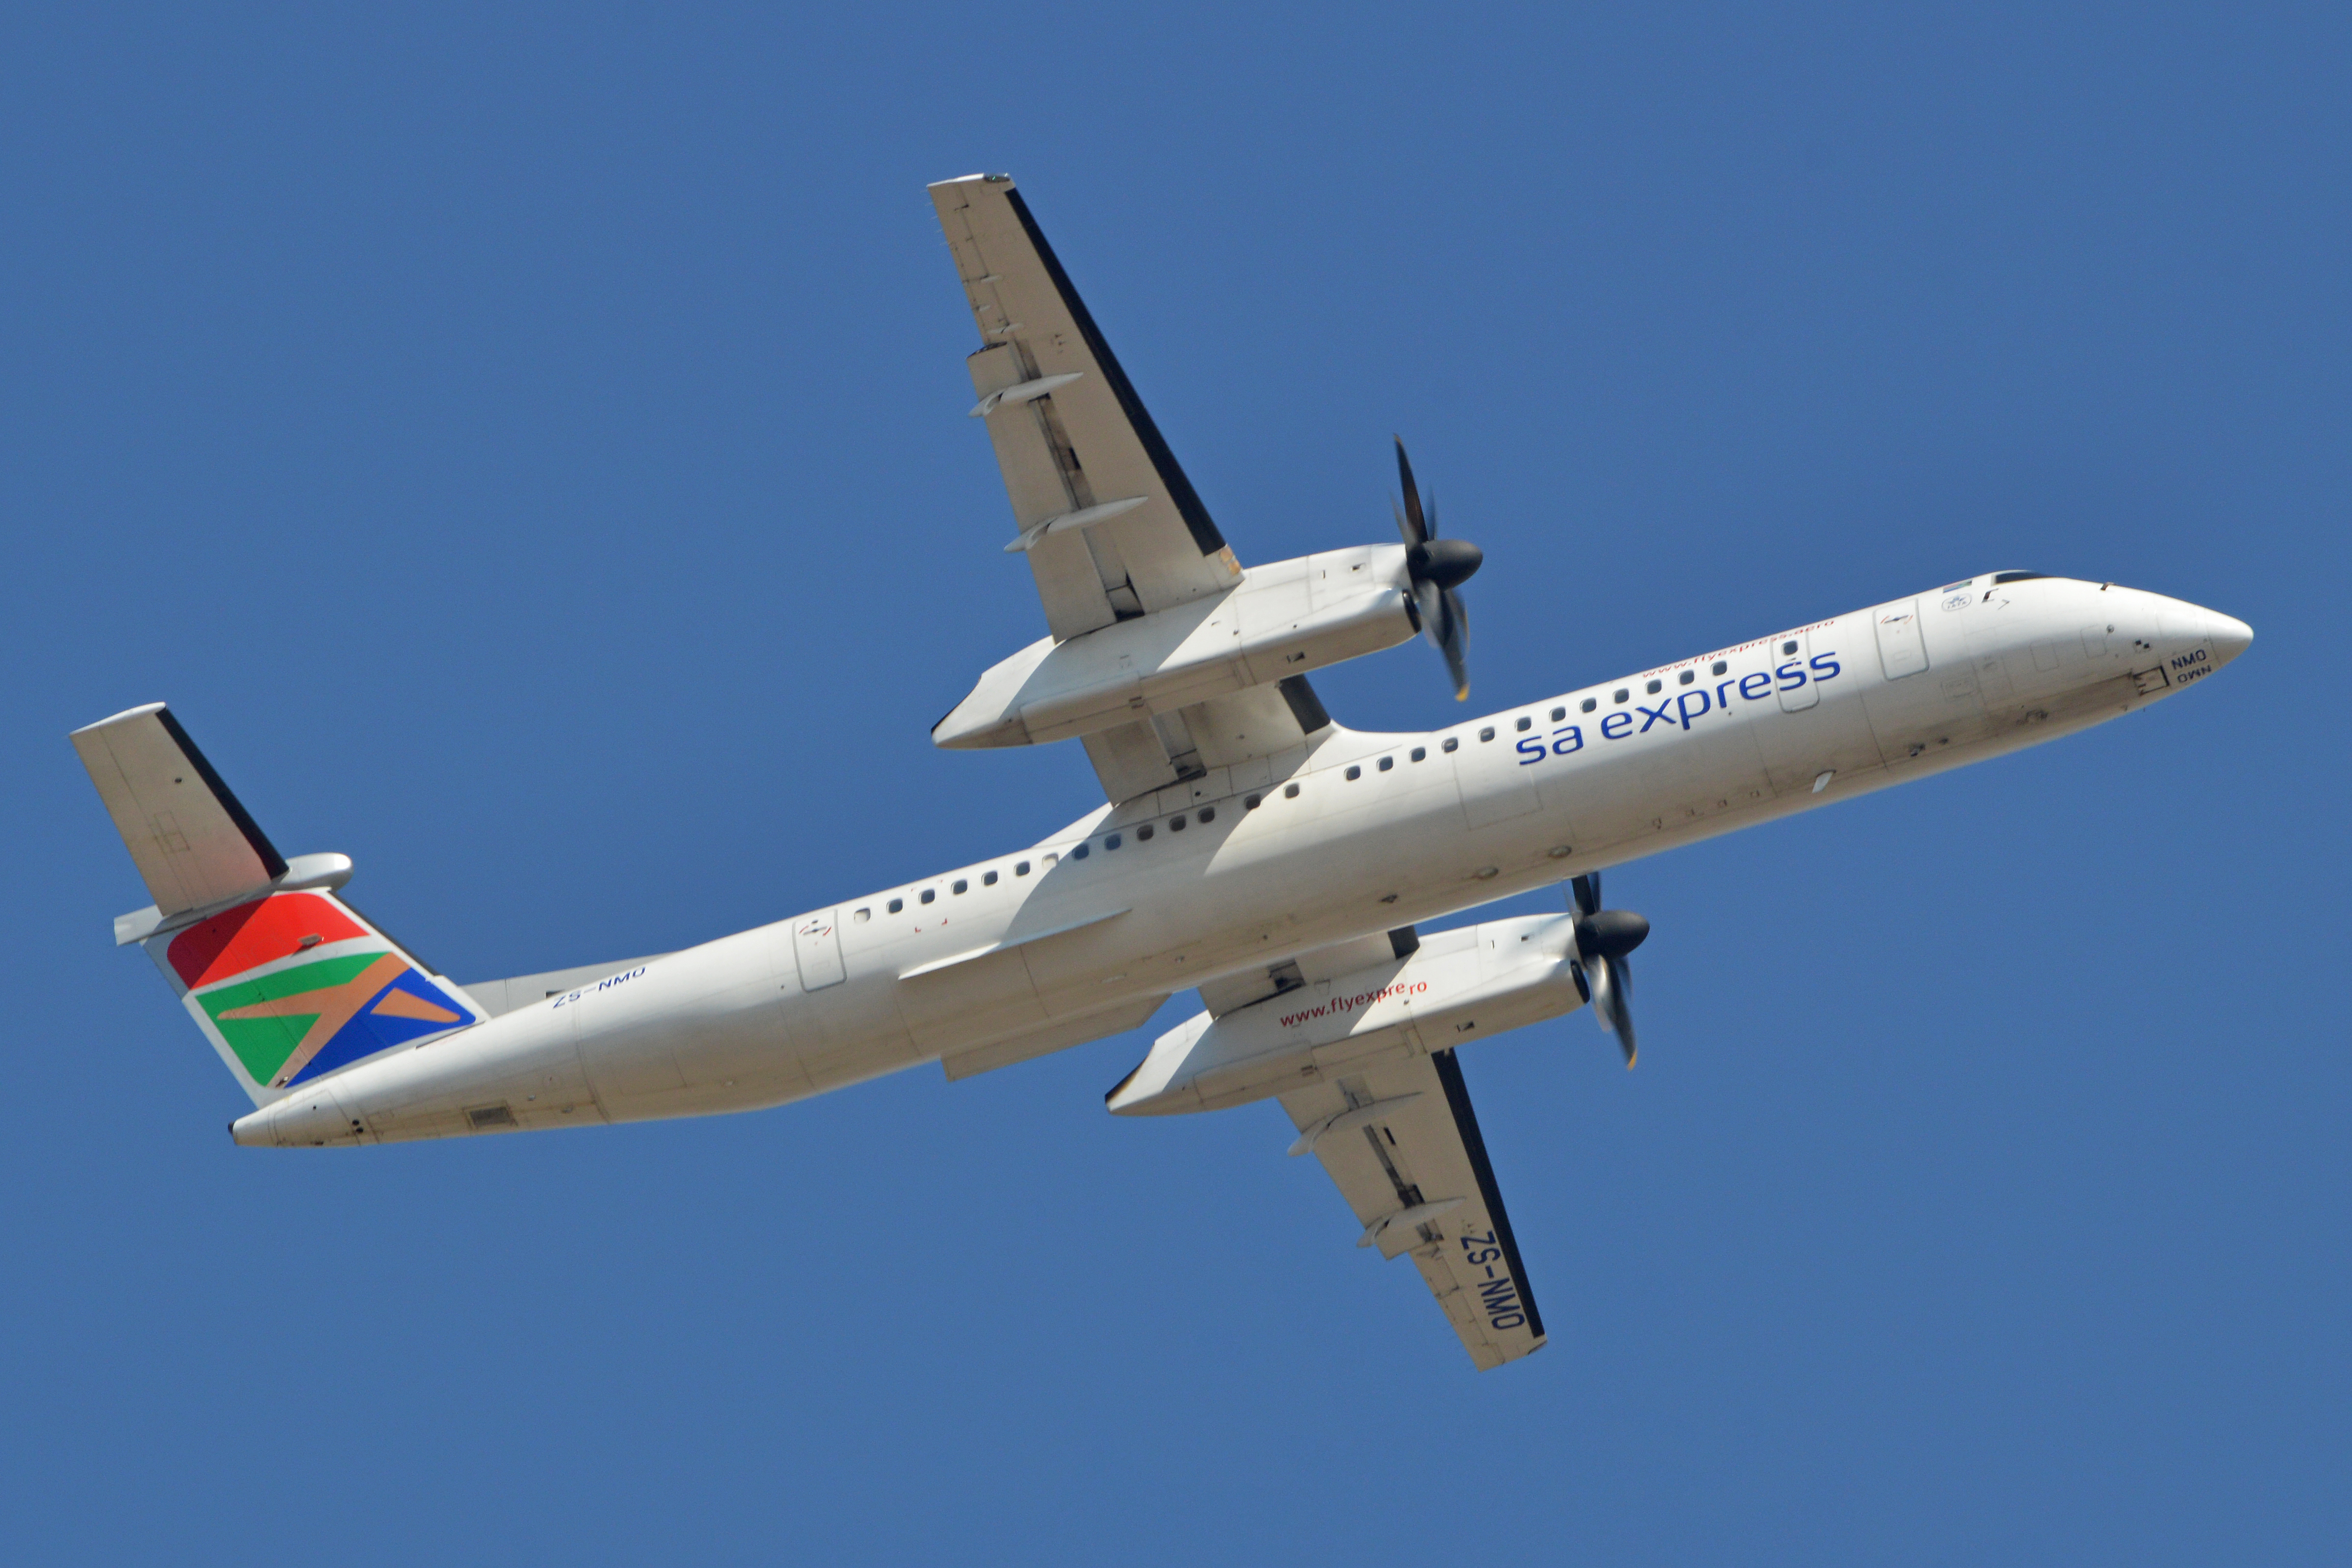 En Bombardier Q400 fra det sydafrikanske flyselskab SA Express. Foto: Alan Wilson